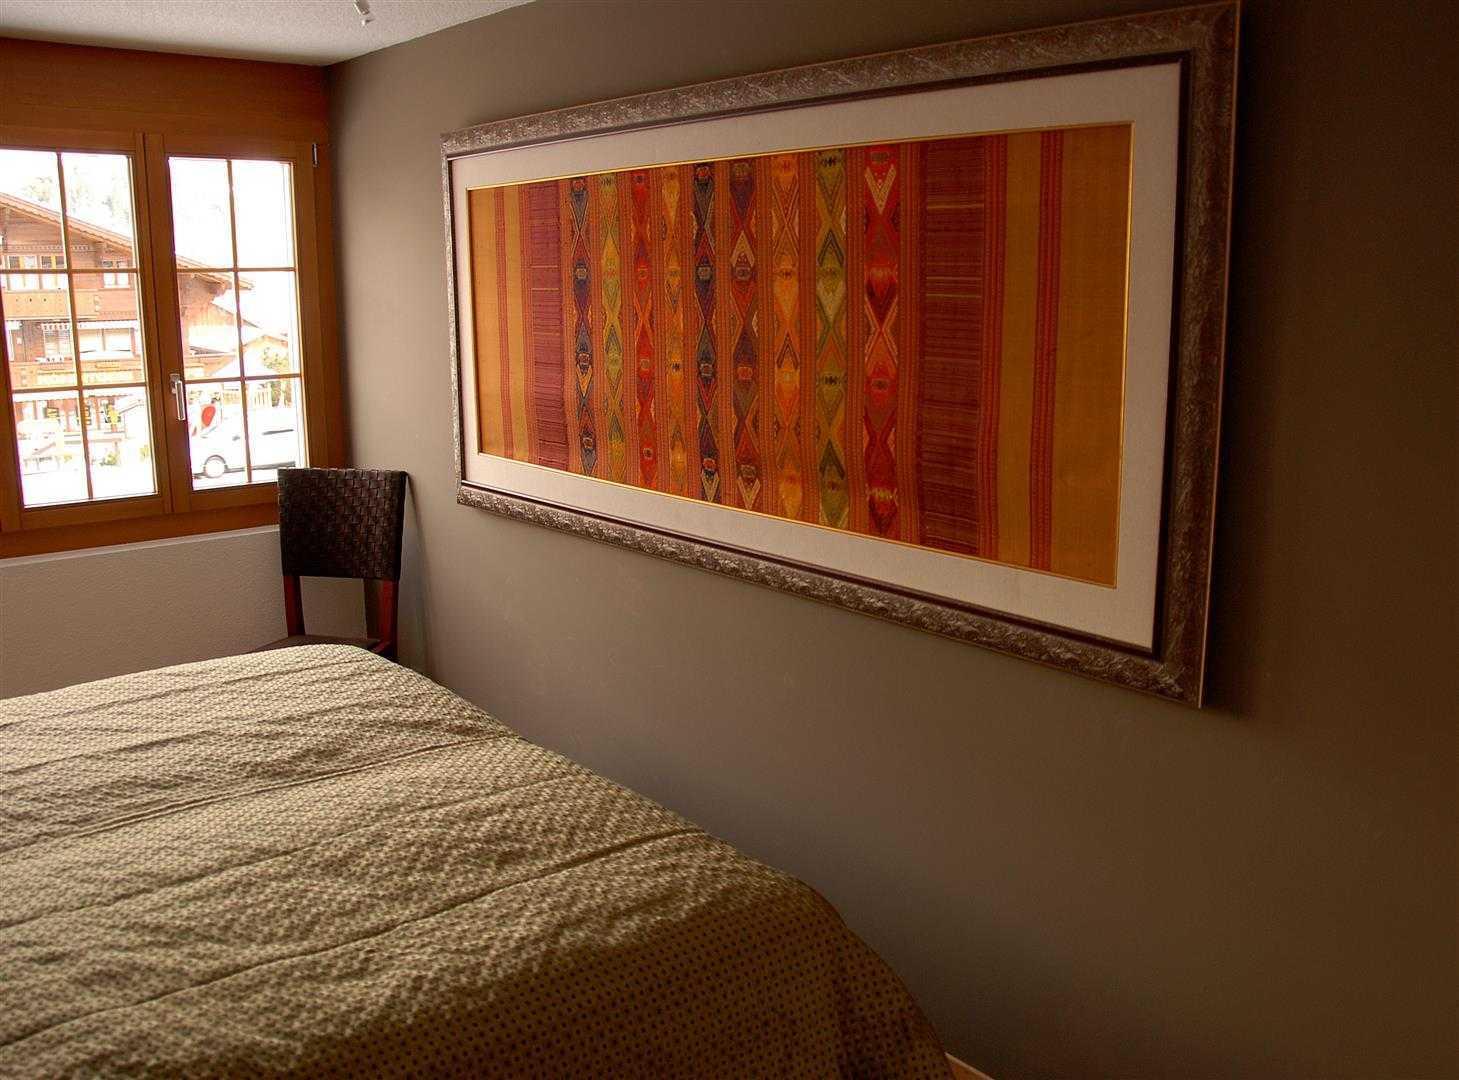 Agung Budi Raharsa Lenk Hotel - Switzerland Switzerland Switzerland Bedroom-2A Minimalis 12768